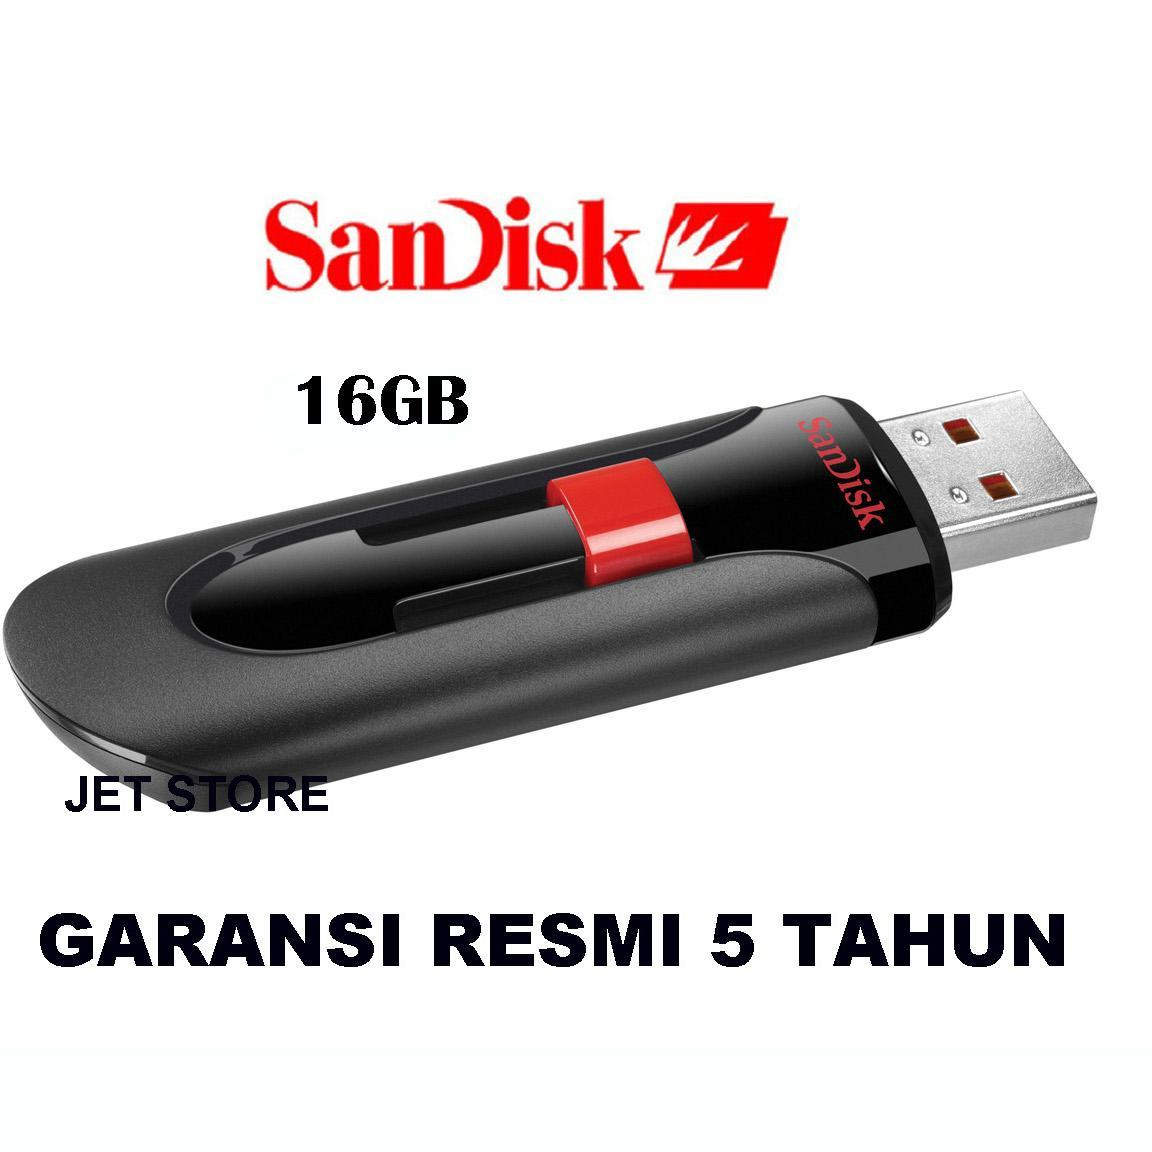 Kelebihan Sandisk Flashdisk Cruzer Blade 16 Gb Terkini Daftar Original Glide Cz60 Hitam